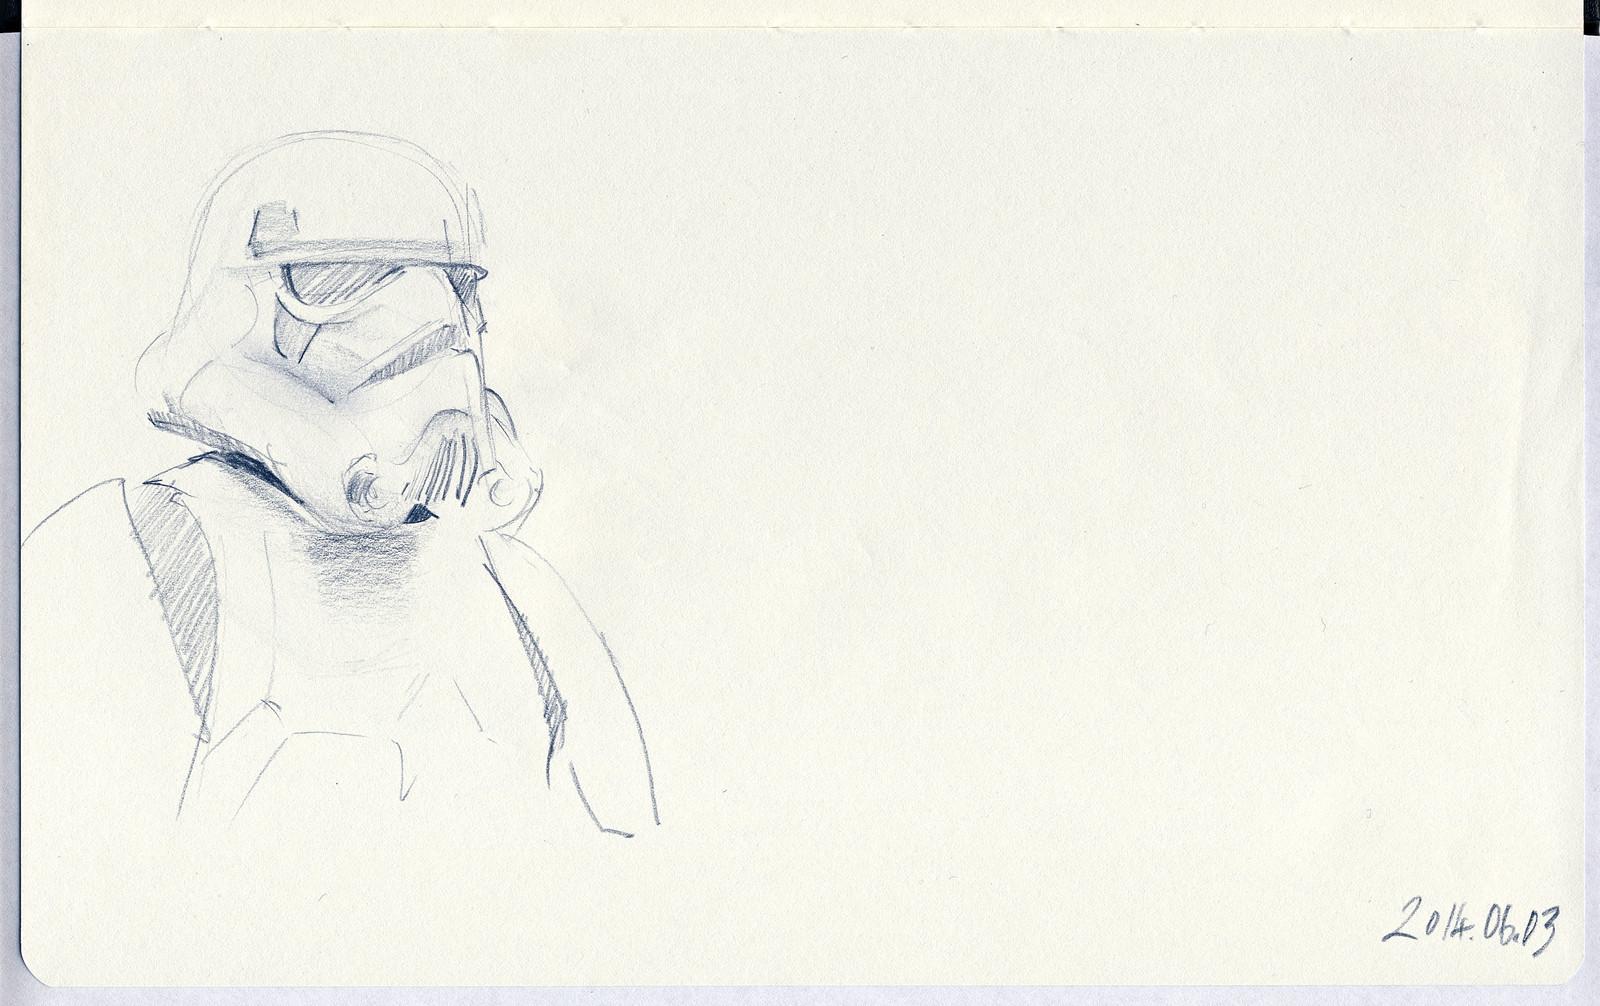 Stormtrooper, Skywalker Ranch, California (2014)